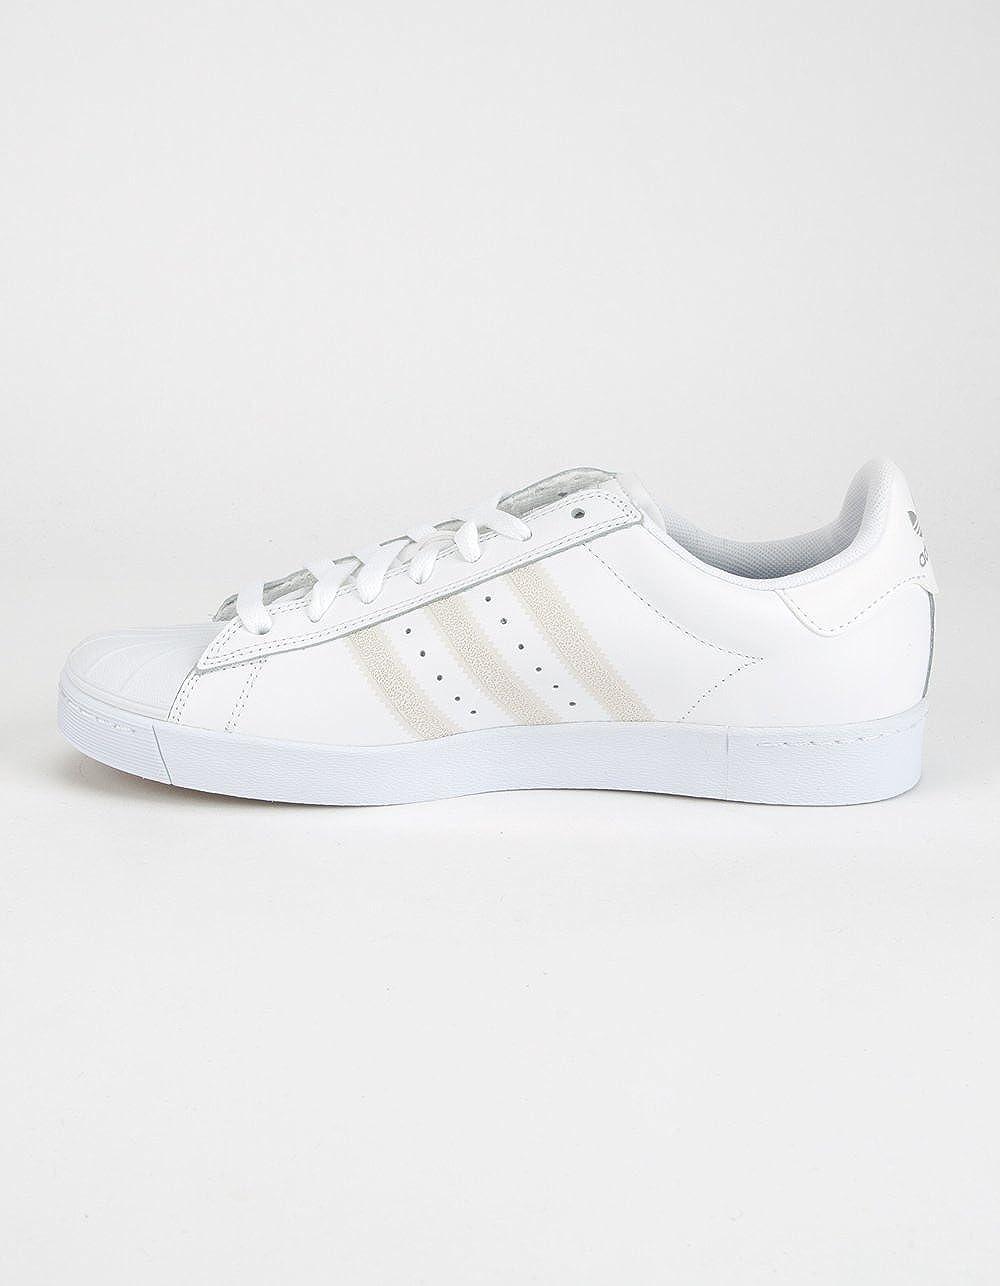 adidas Originals Men's Superstar Vulc ADV Running Shoe Ftwwht/Ftwwht/Silvmt